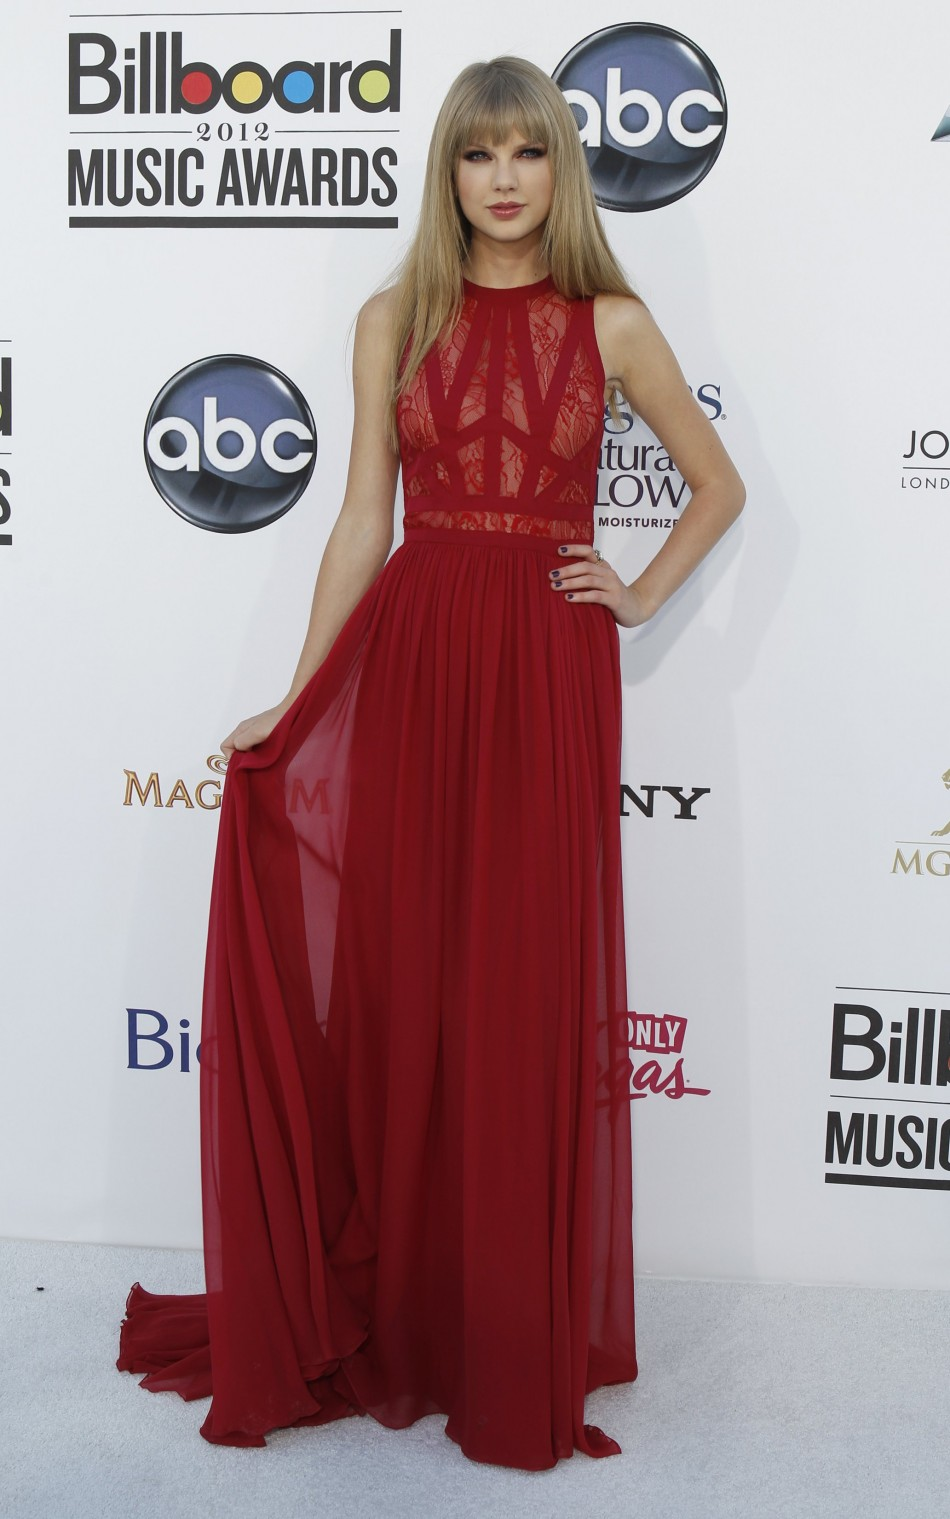 Taylor Swift's Sheer Dress